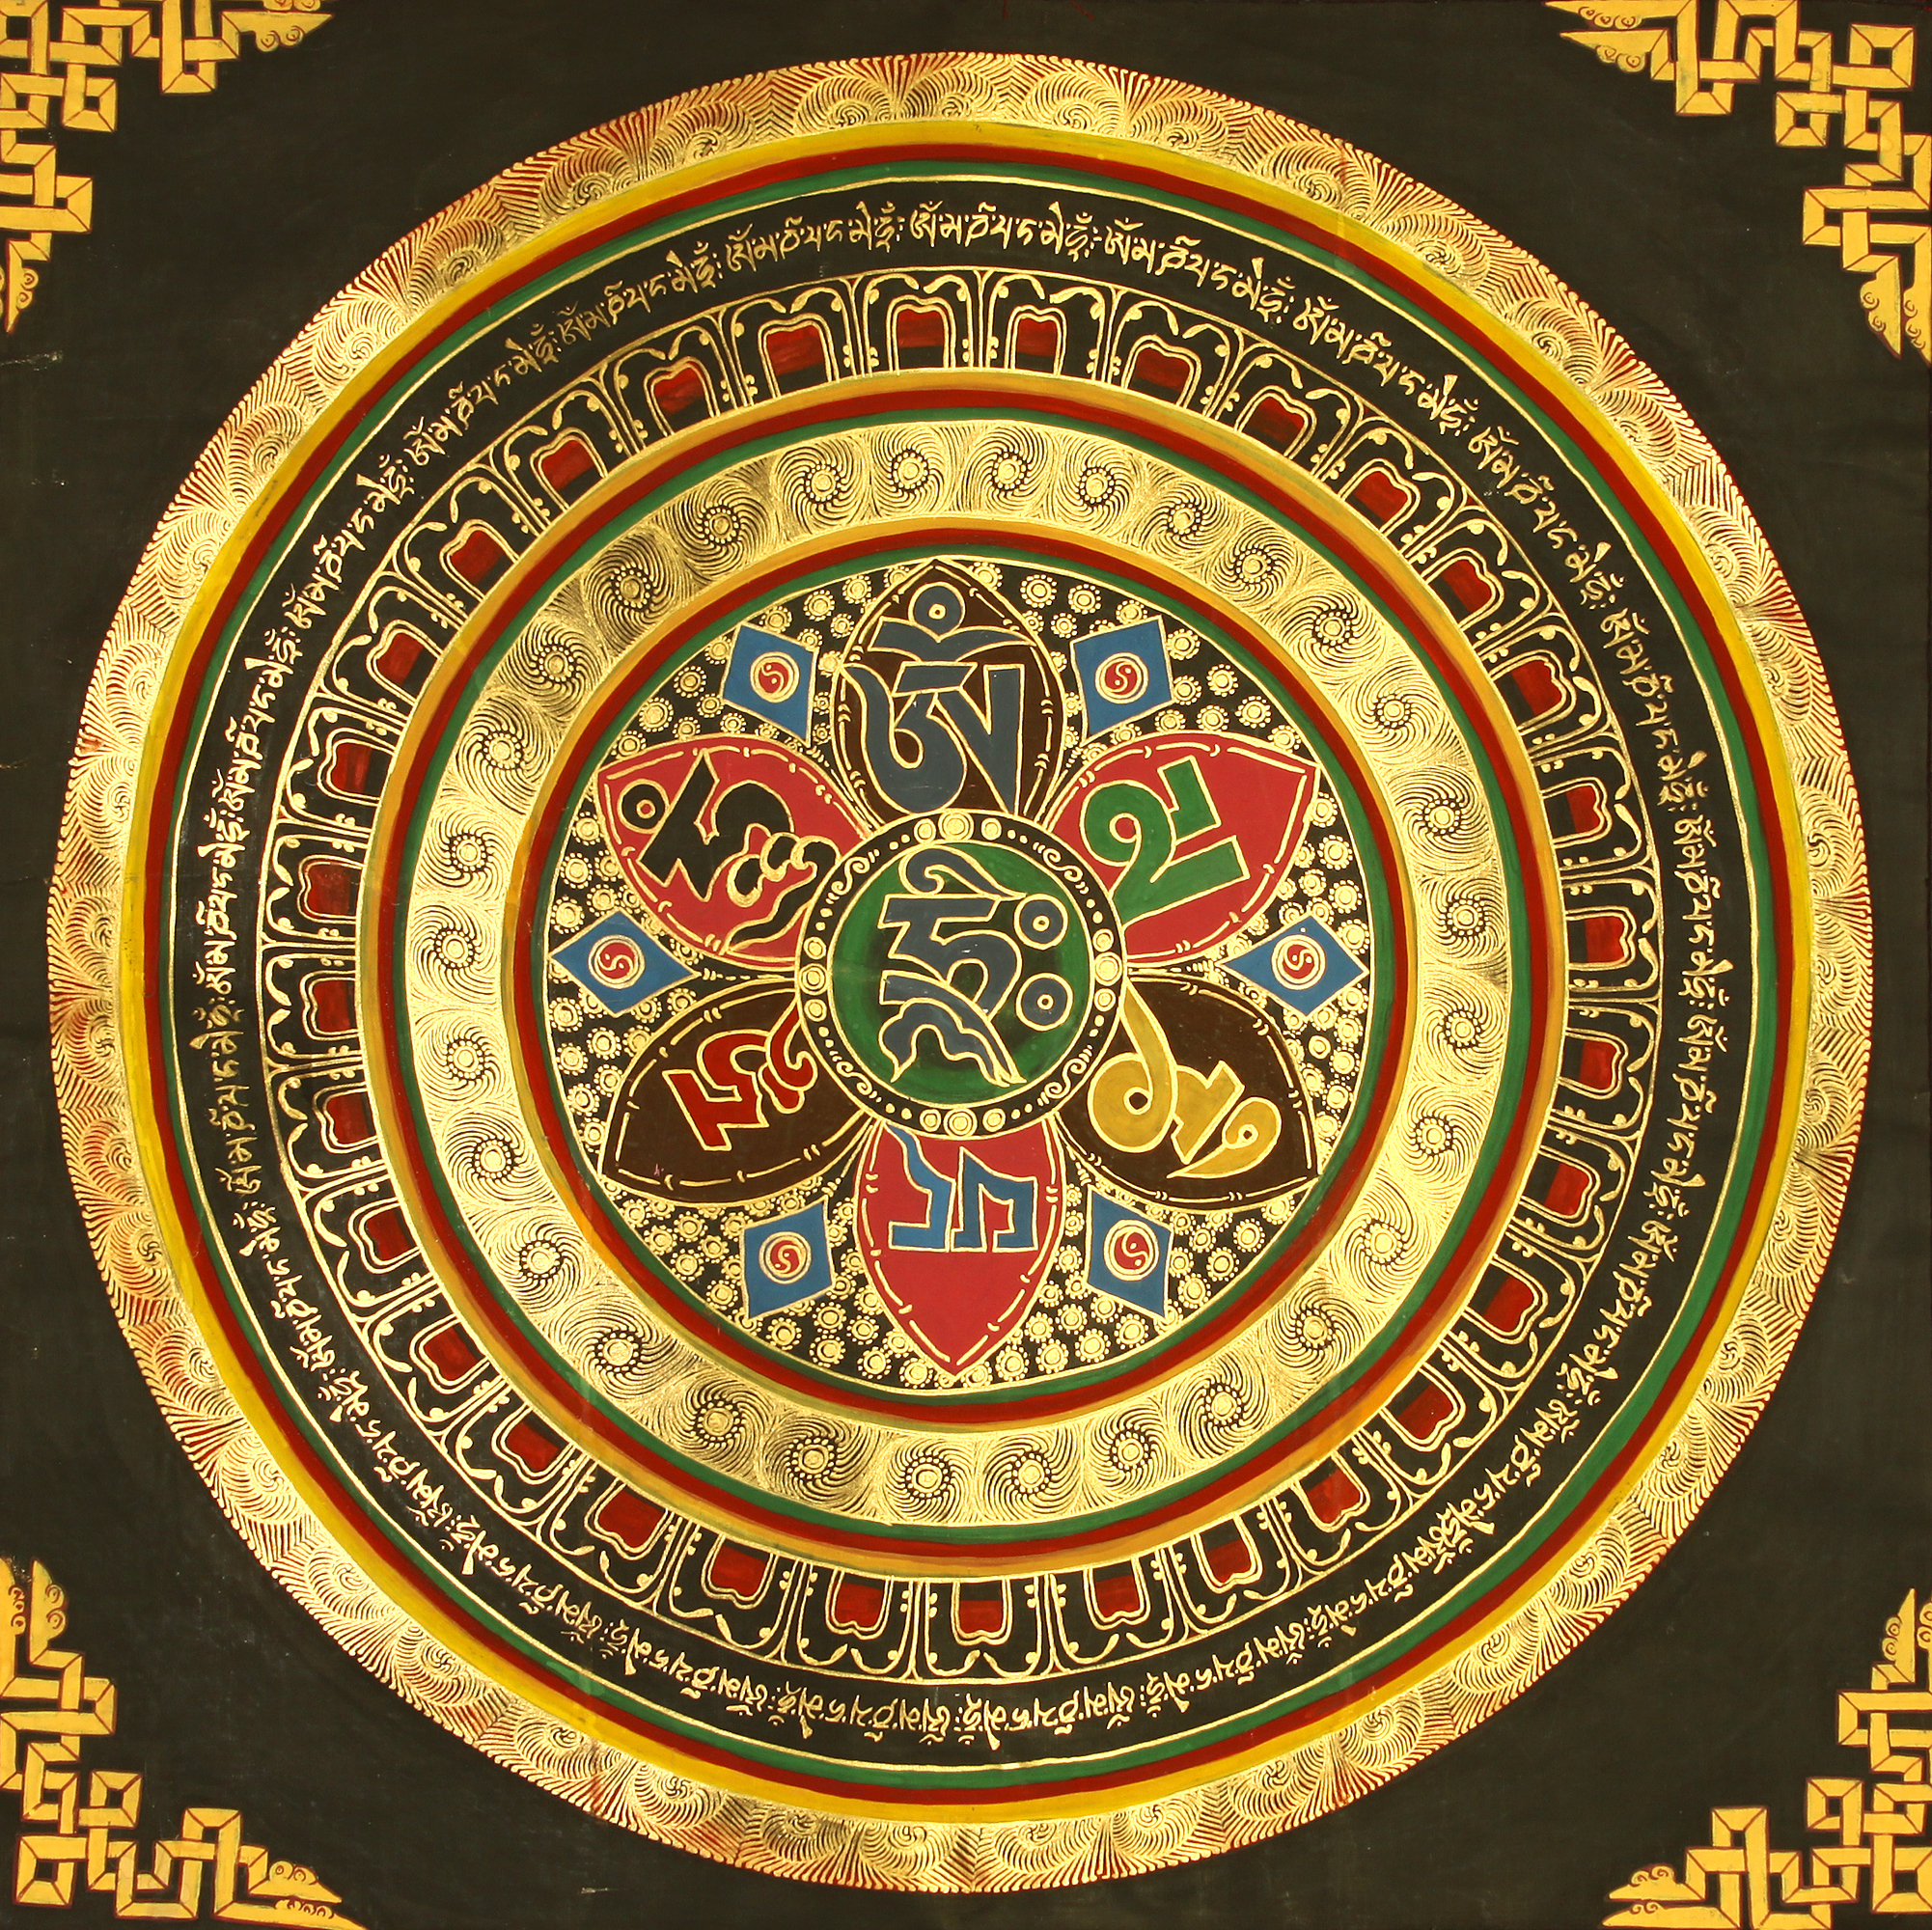 Mandala Wallpaper wallpaper Buddhist Mandala Wallpaper hd wallpaper 2002x2000